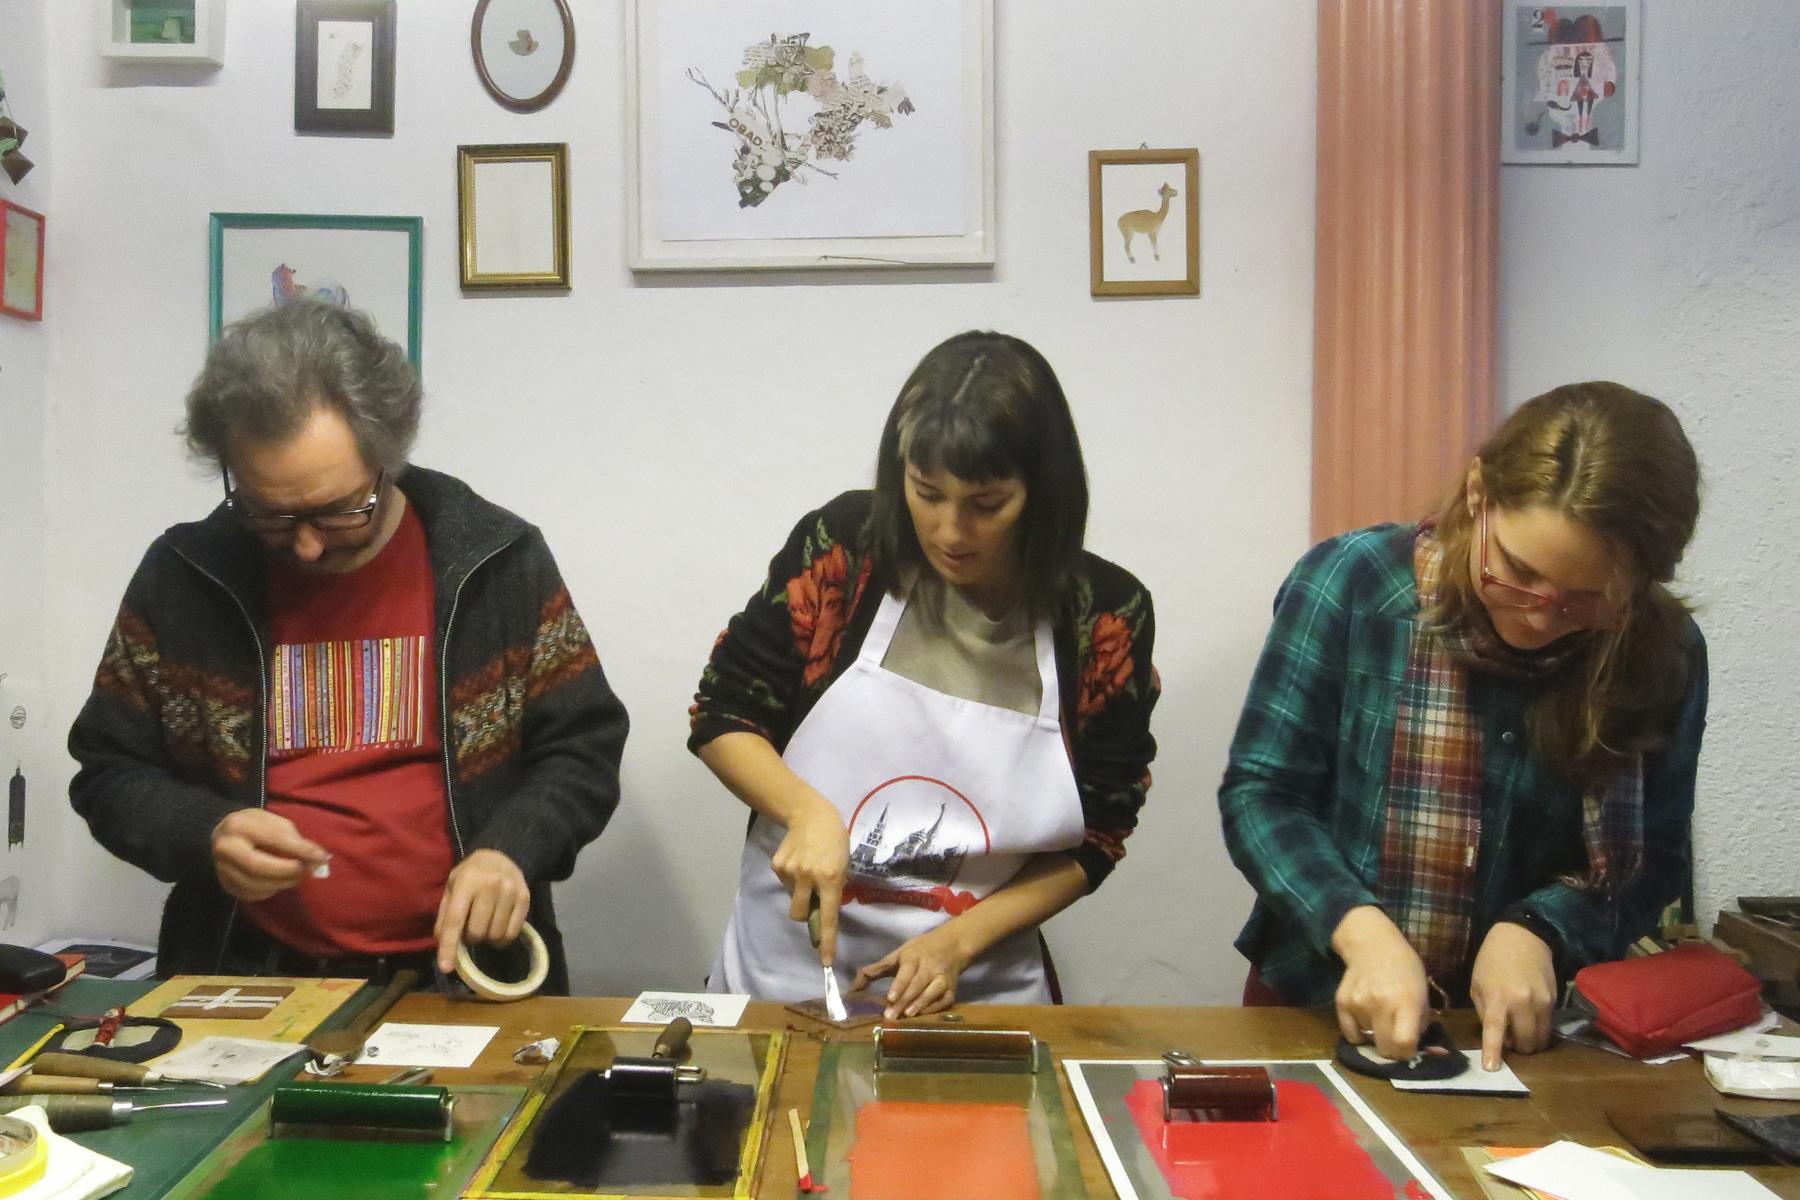 A-xilopress-xilografia-ilustracion-fotopolimeros-grabado-taller-letra-por-letra-papel-principal-letterpress-imprenta-tipografica-1.jpg